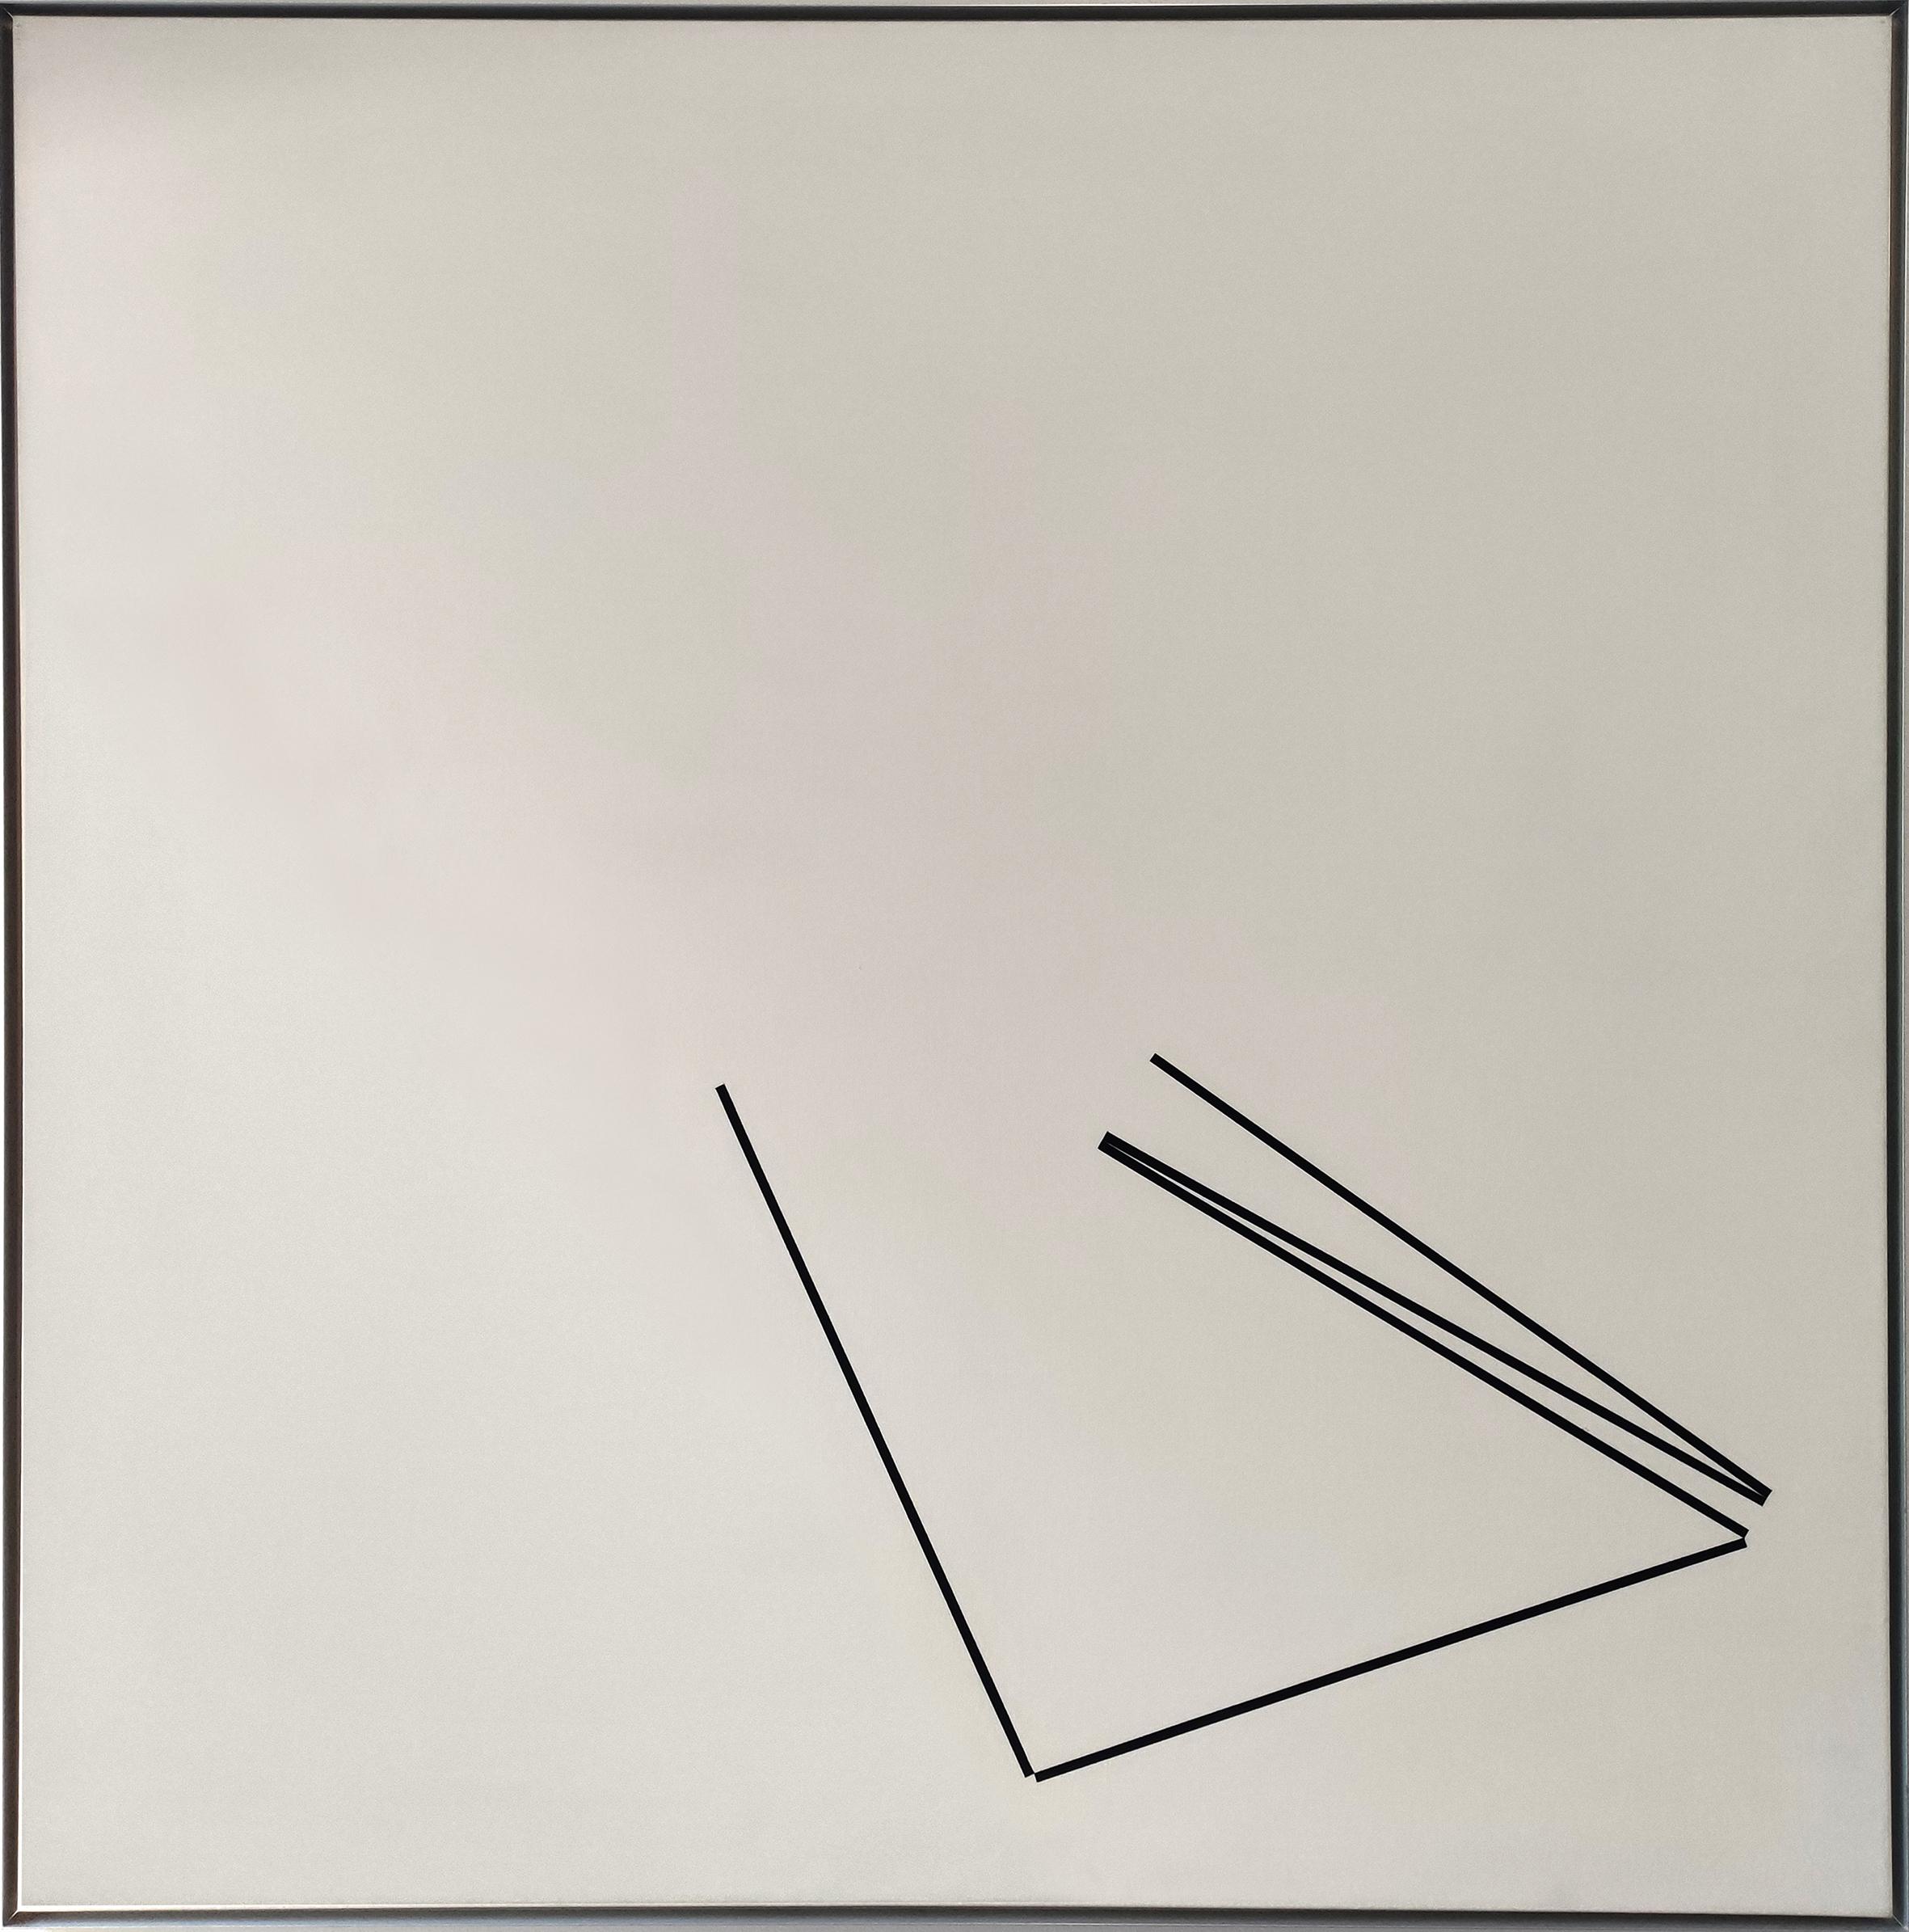 Diet Sayler, Variation W-2, 1975, Acryl auf Leinwand, 140x140cm